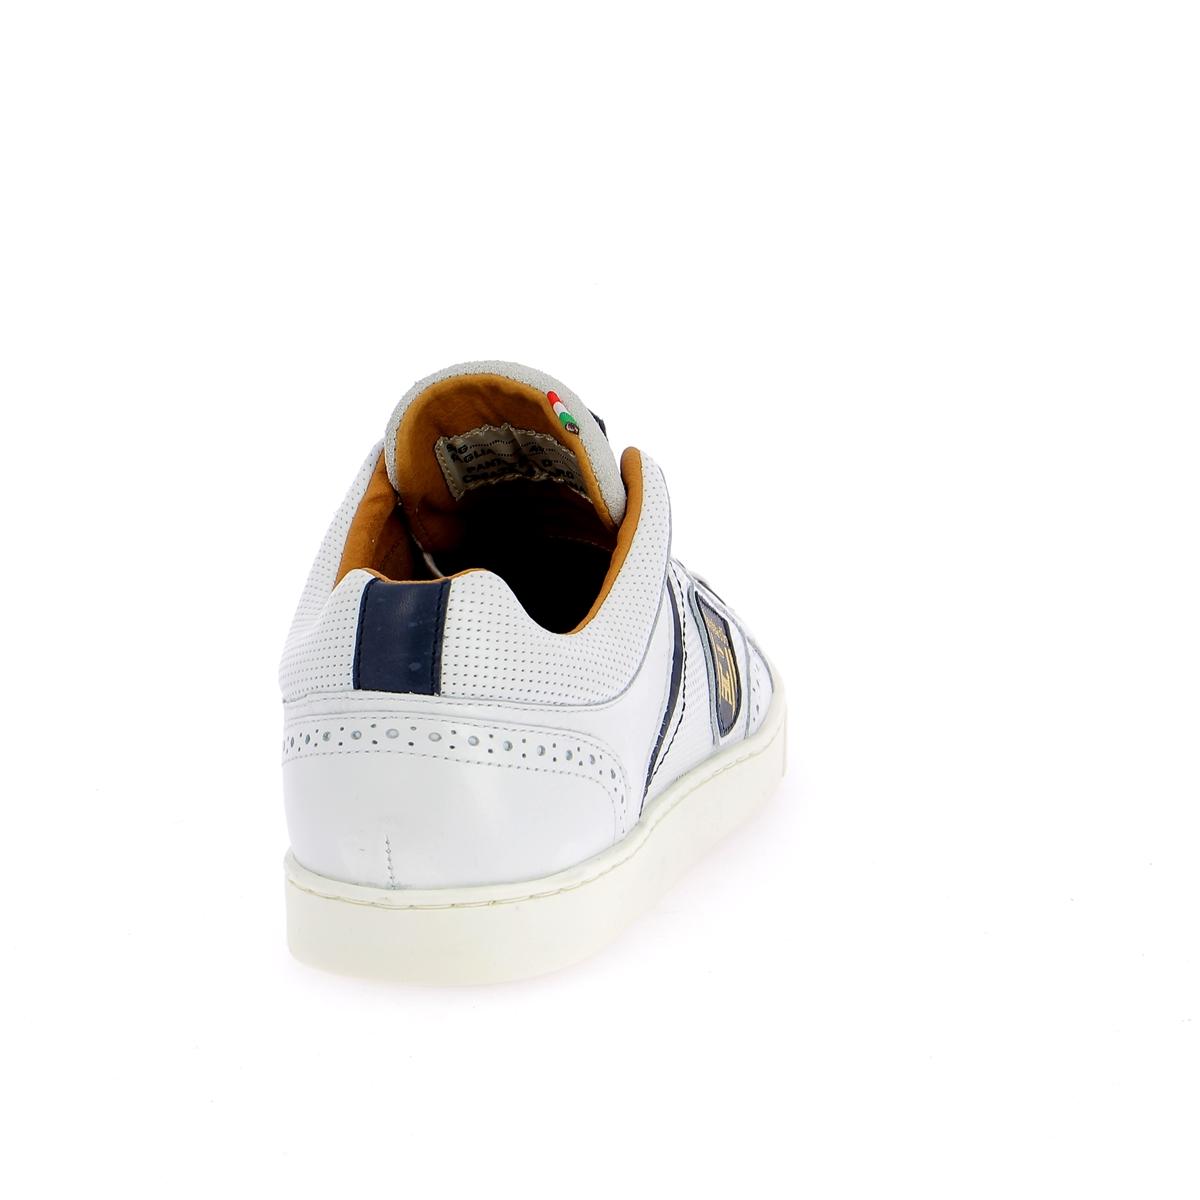 Pantofola D'oro Basket blanc